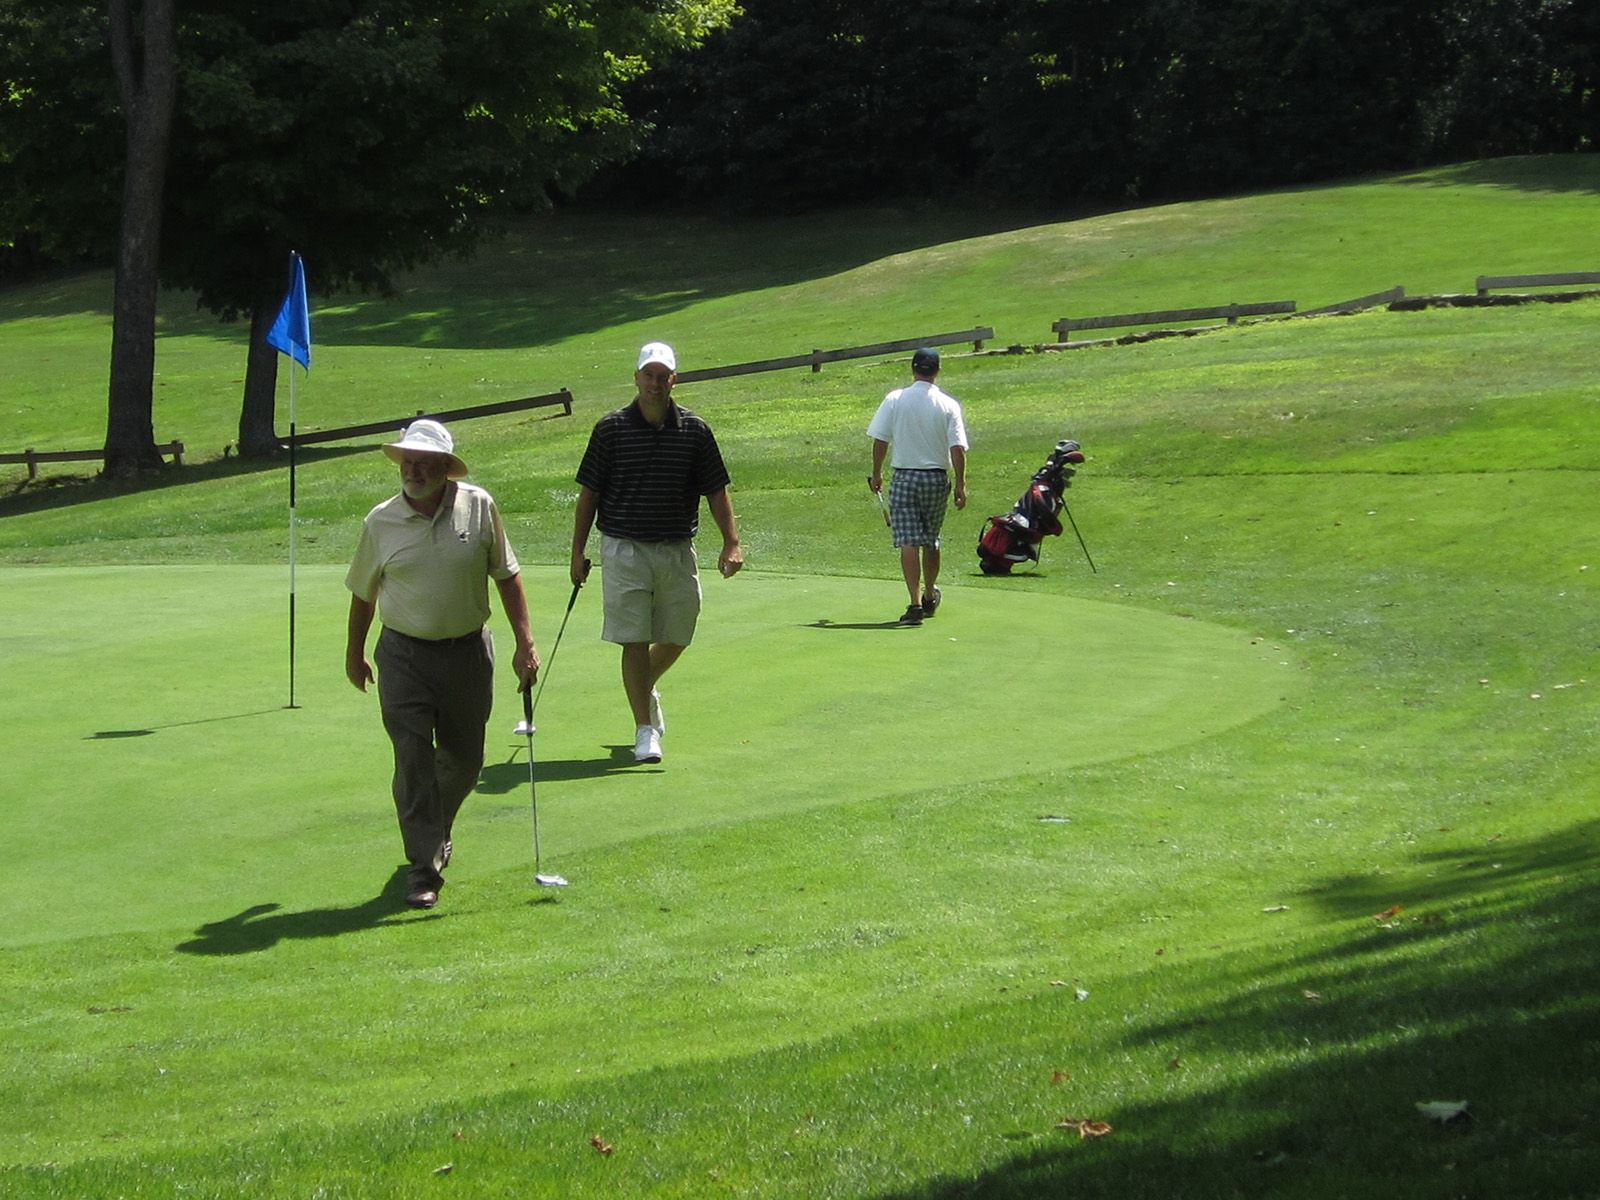 Country Club Member Golf Photo Gallery Skyline Country Club Lanesborough Massachusetts Play Golf Country Club Skyline